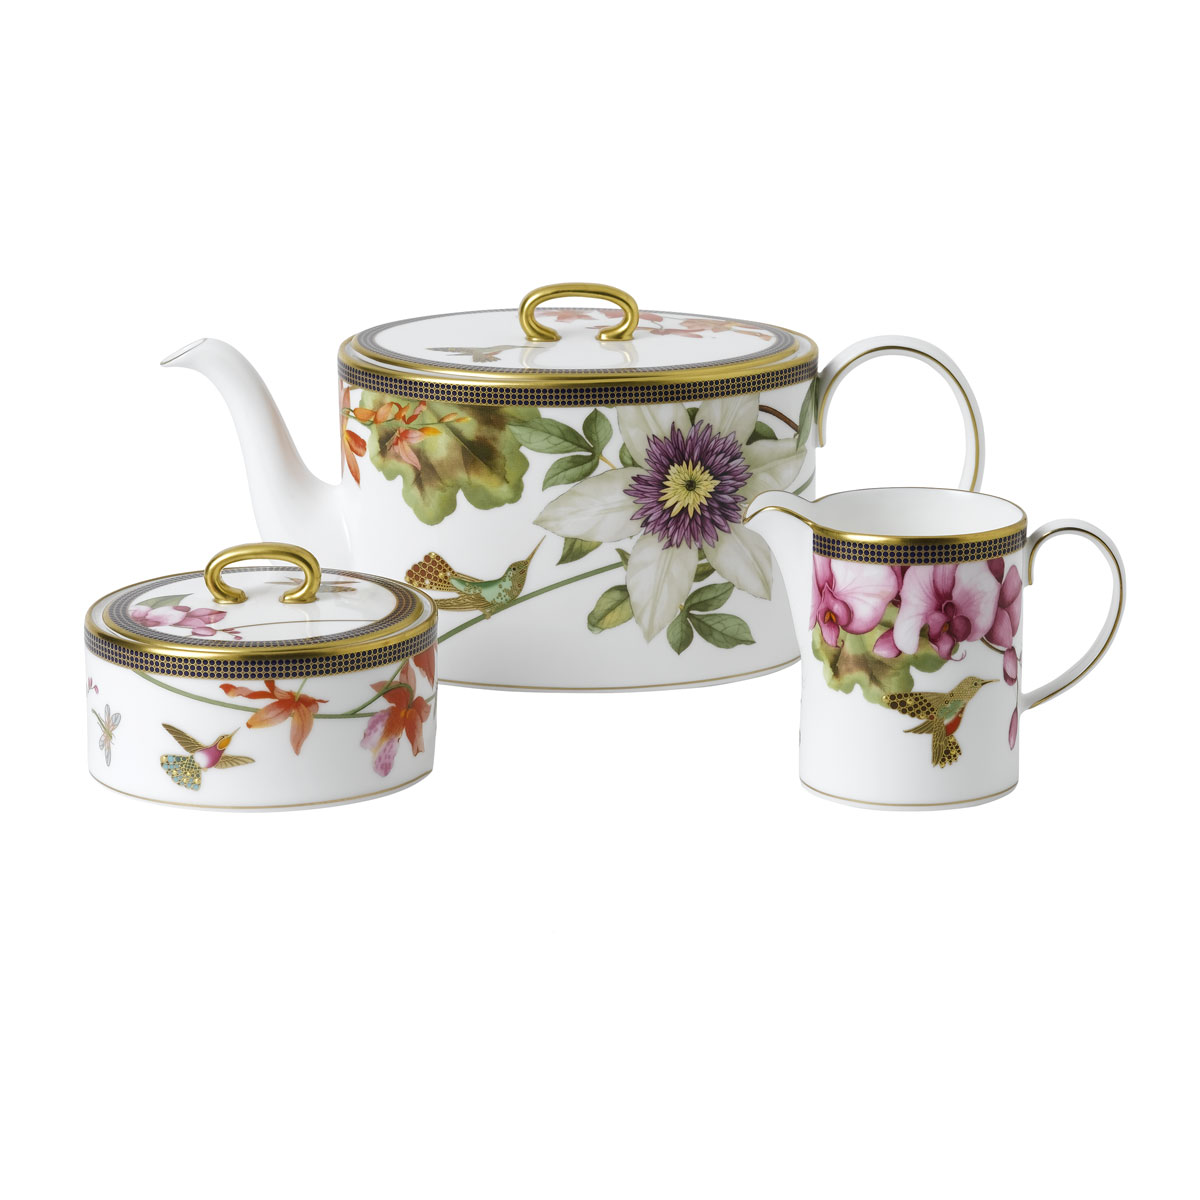 Wedgwood Hummingbird 3-Piece Tea Set (Teapot, Sugar and Creamer)